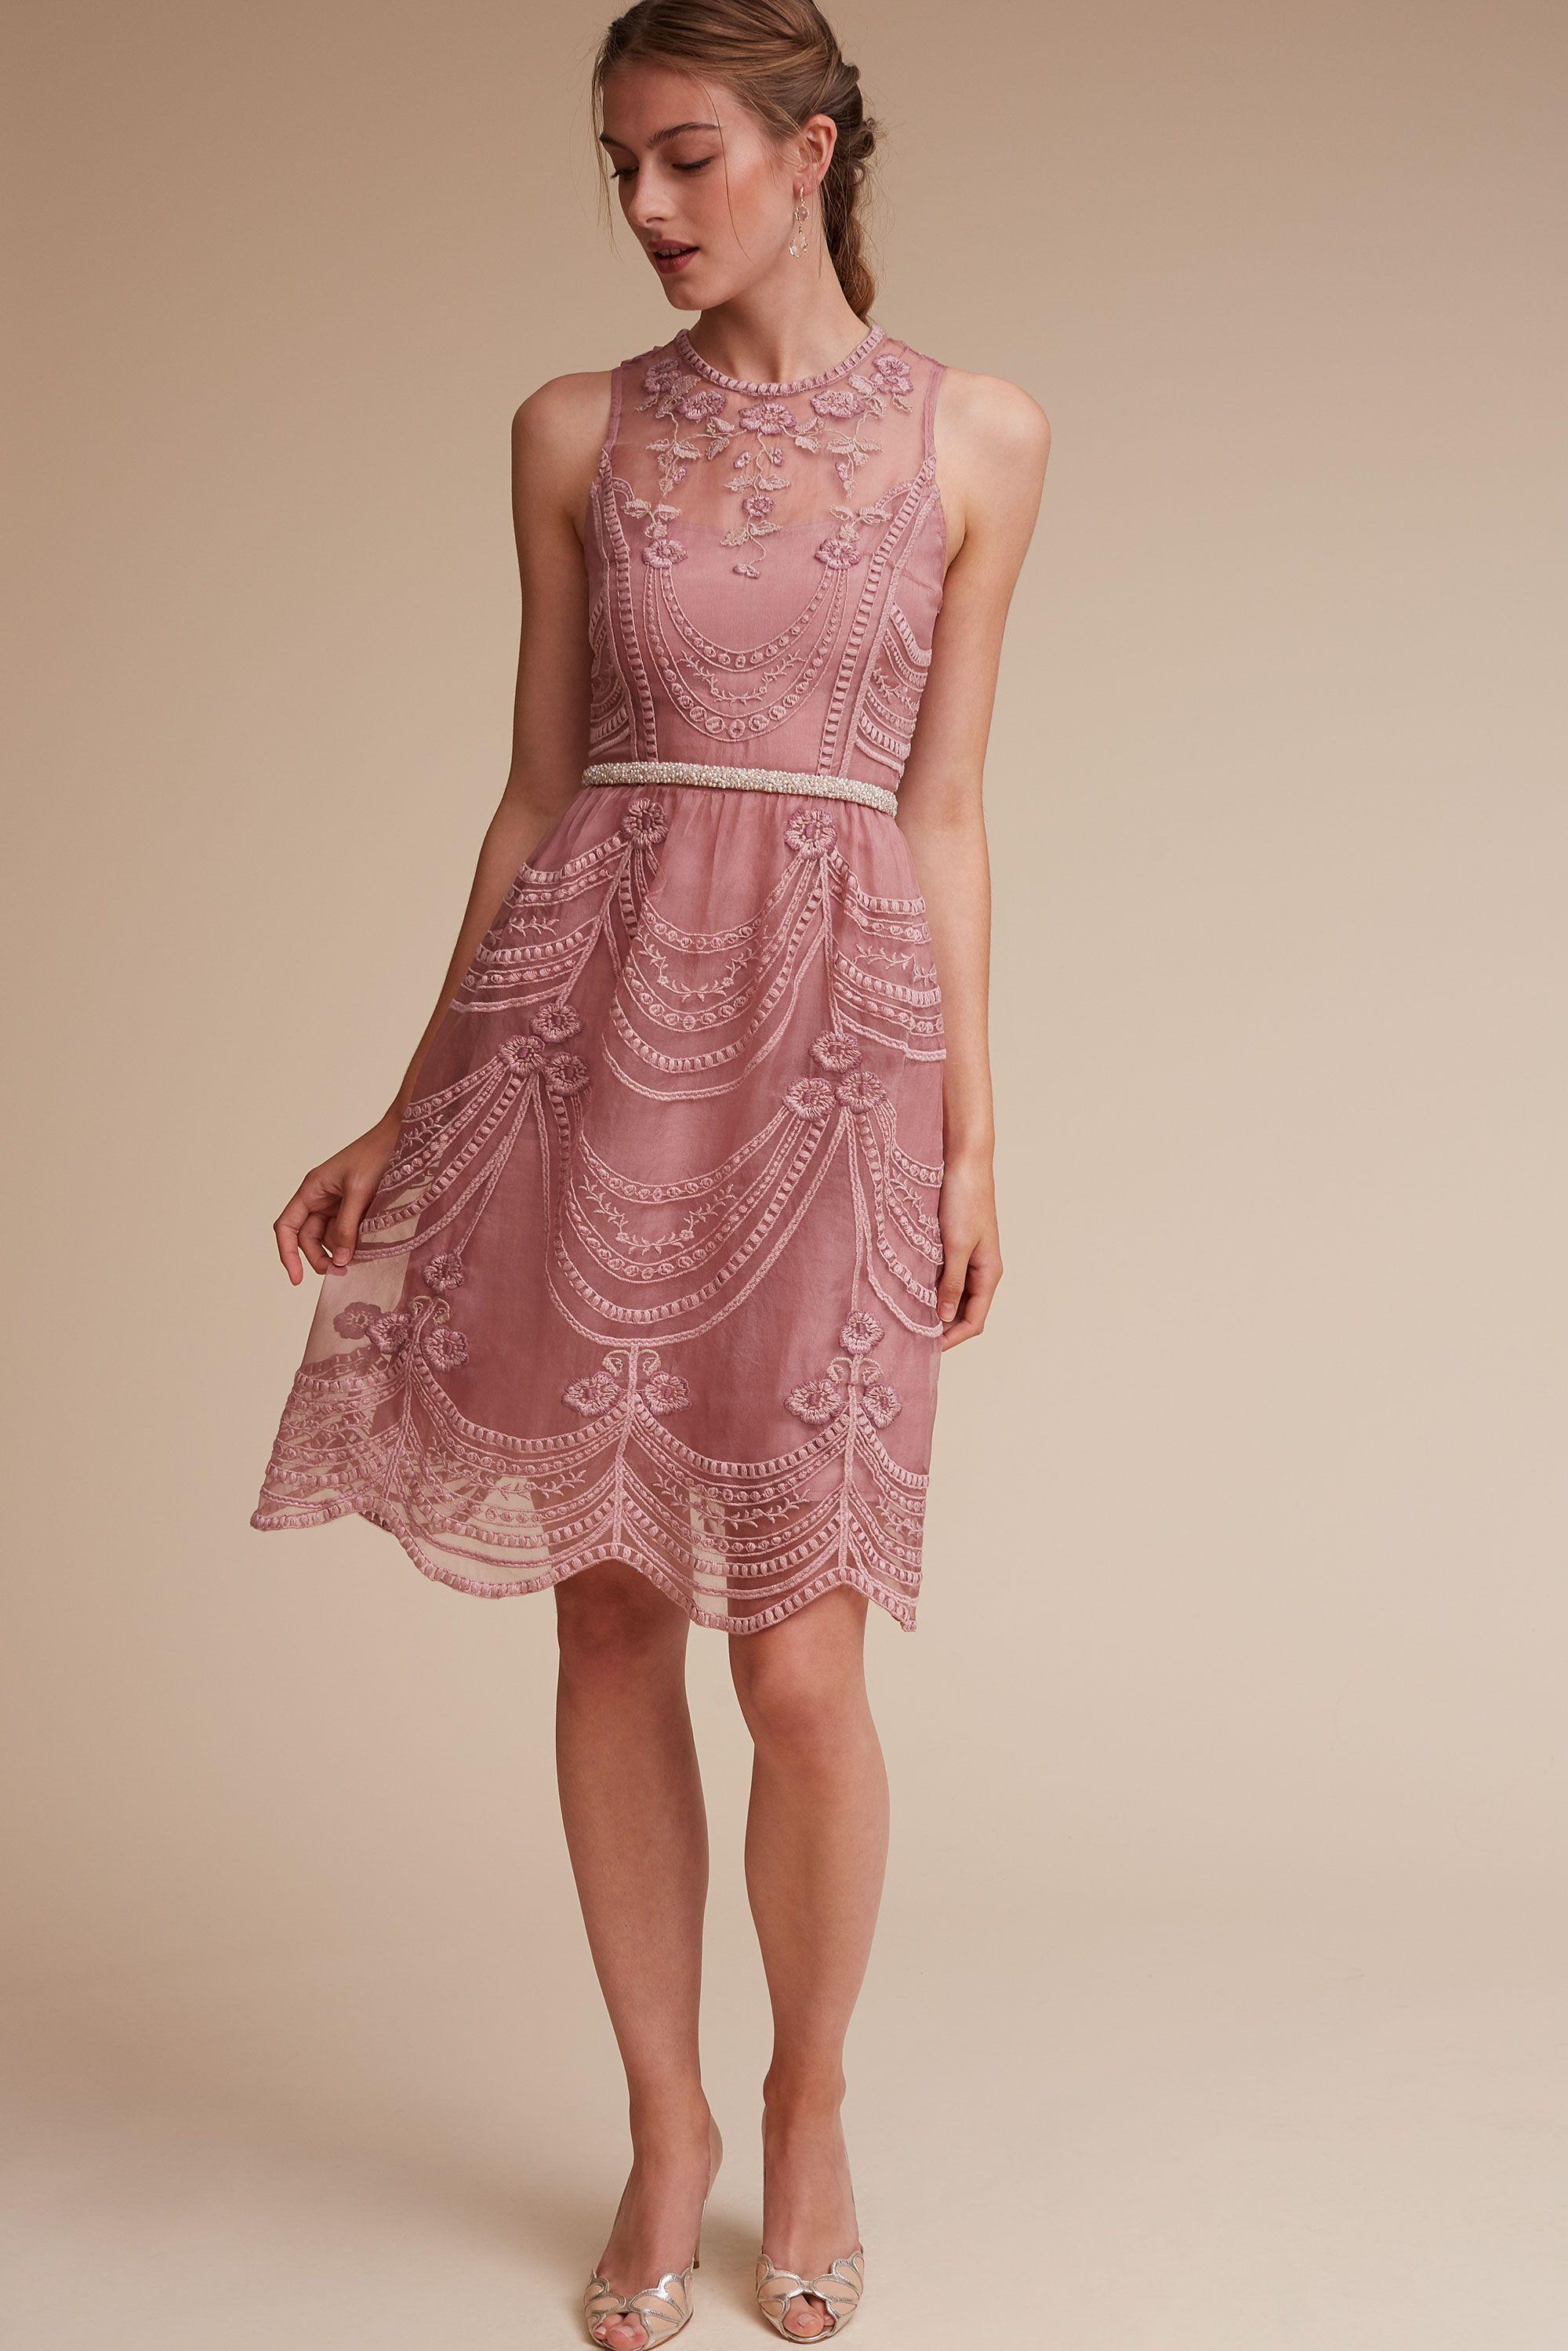 Wedding guest dress ideas  Anessa Dress from BHLDN  Stitch Fix Idea Board  Pinterest  Dress